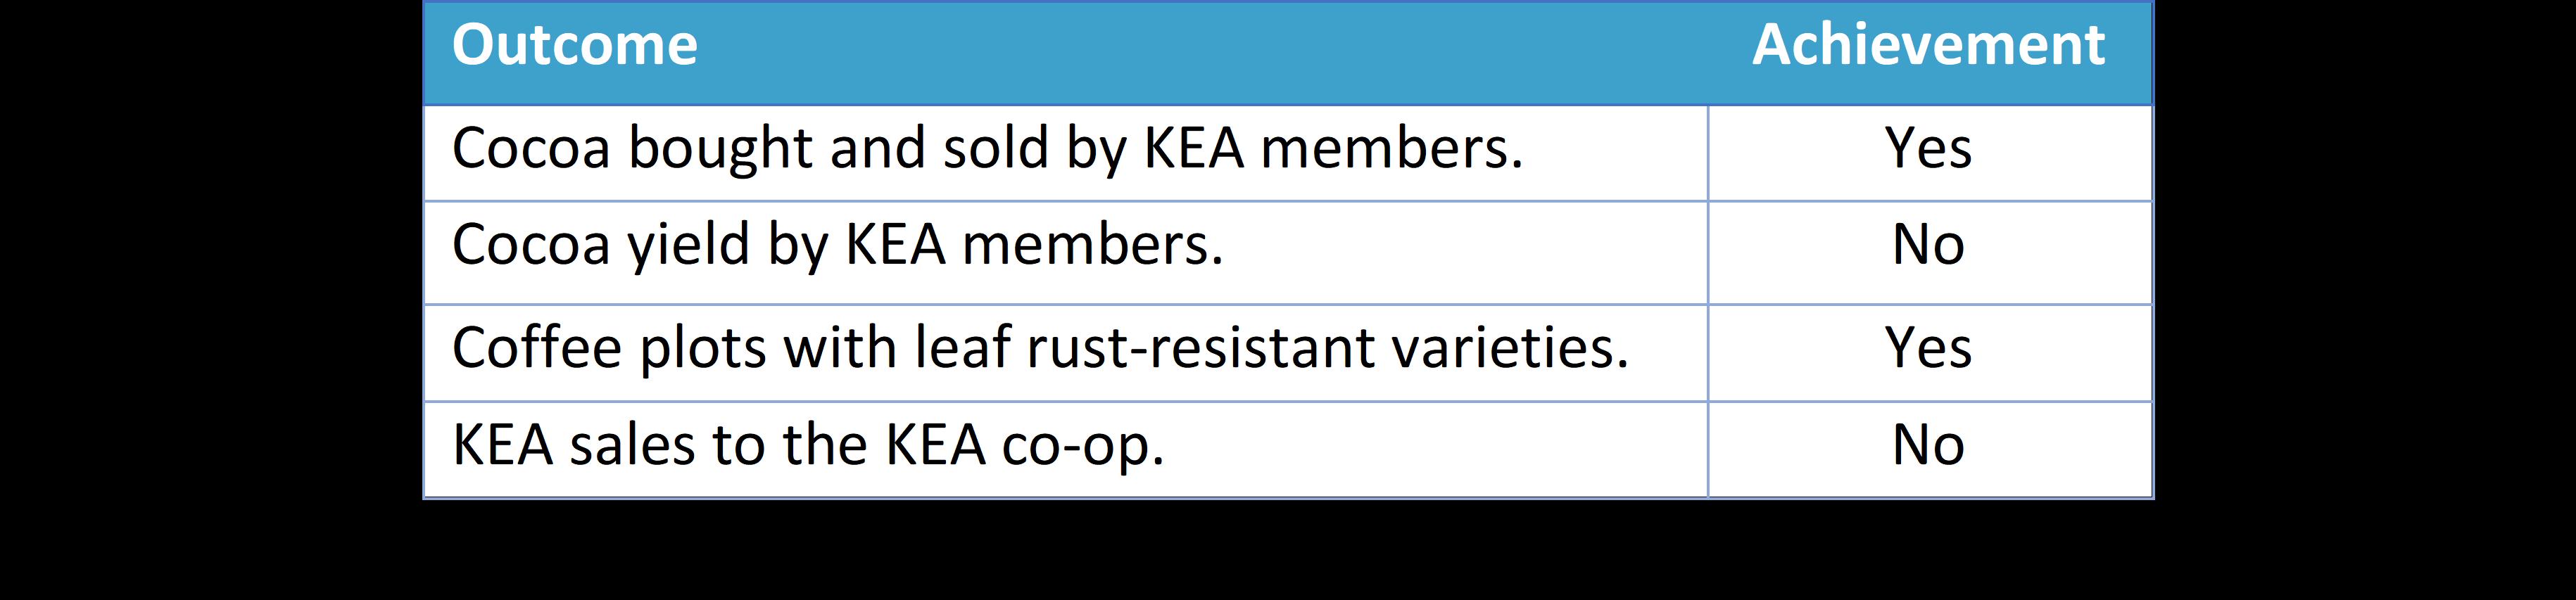 Outcome summary for the Asháninka Impact Bond